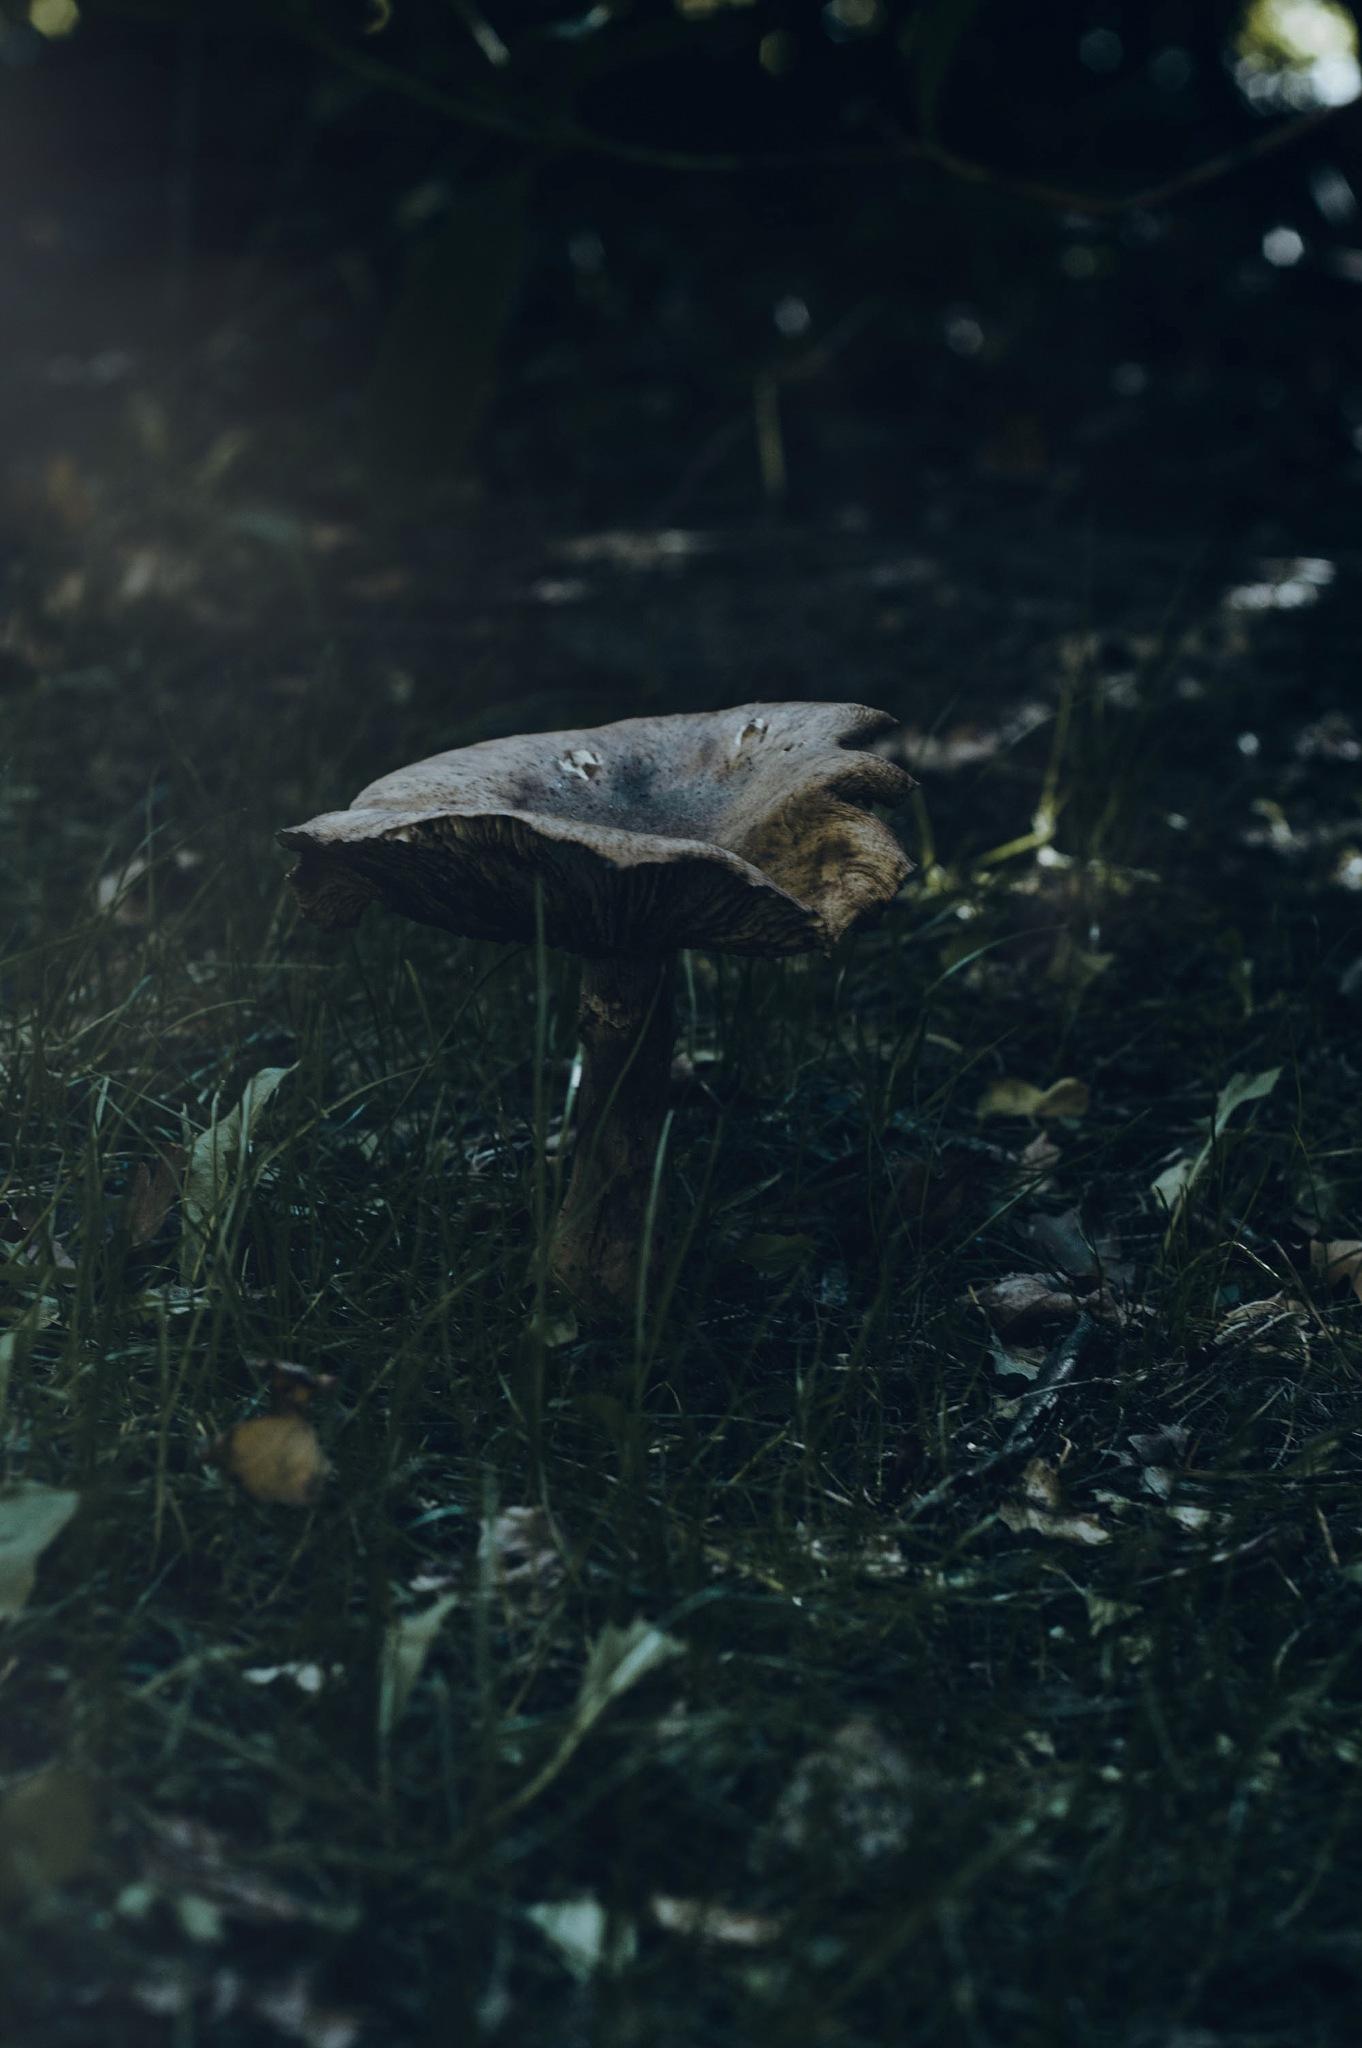 Saffron Milk Cap in a hazy dusk by antonia kofod